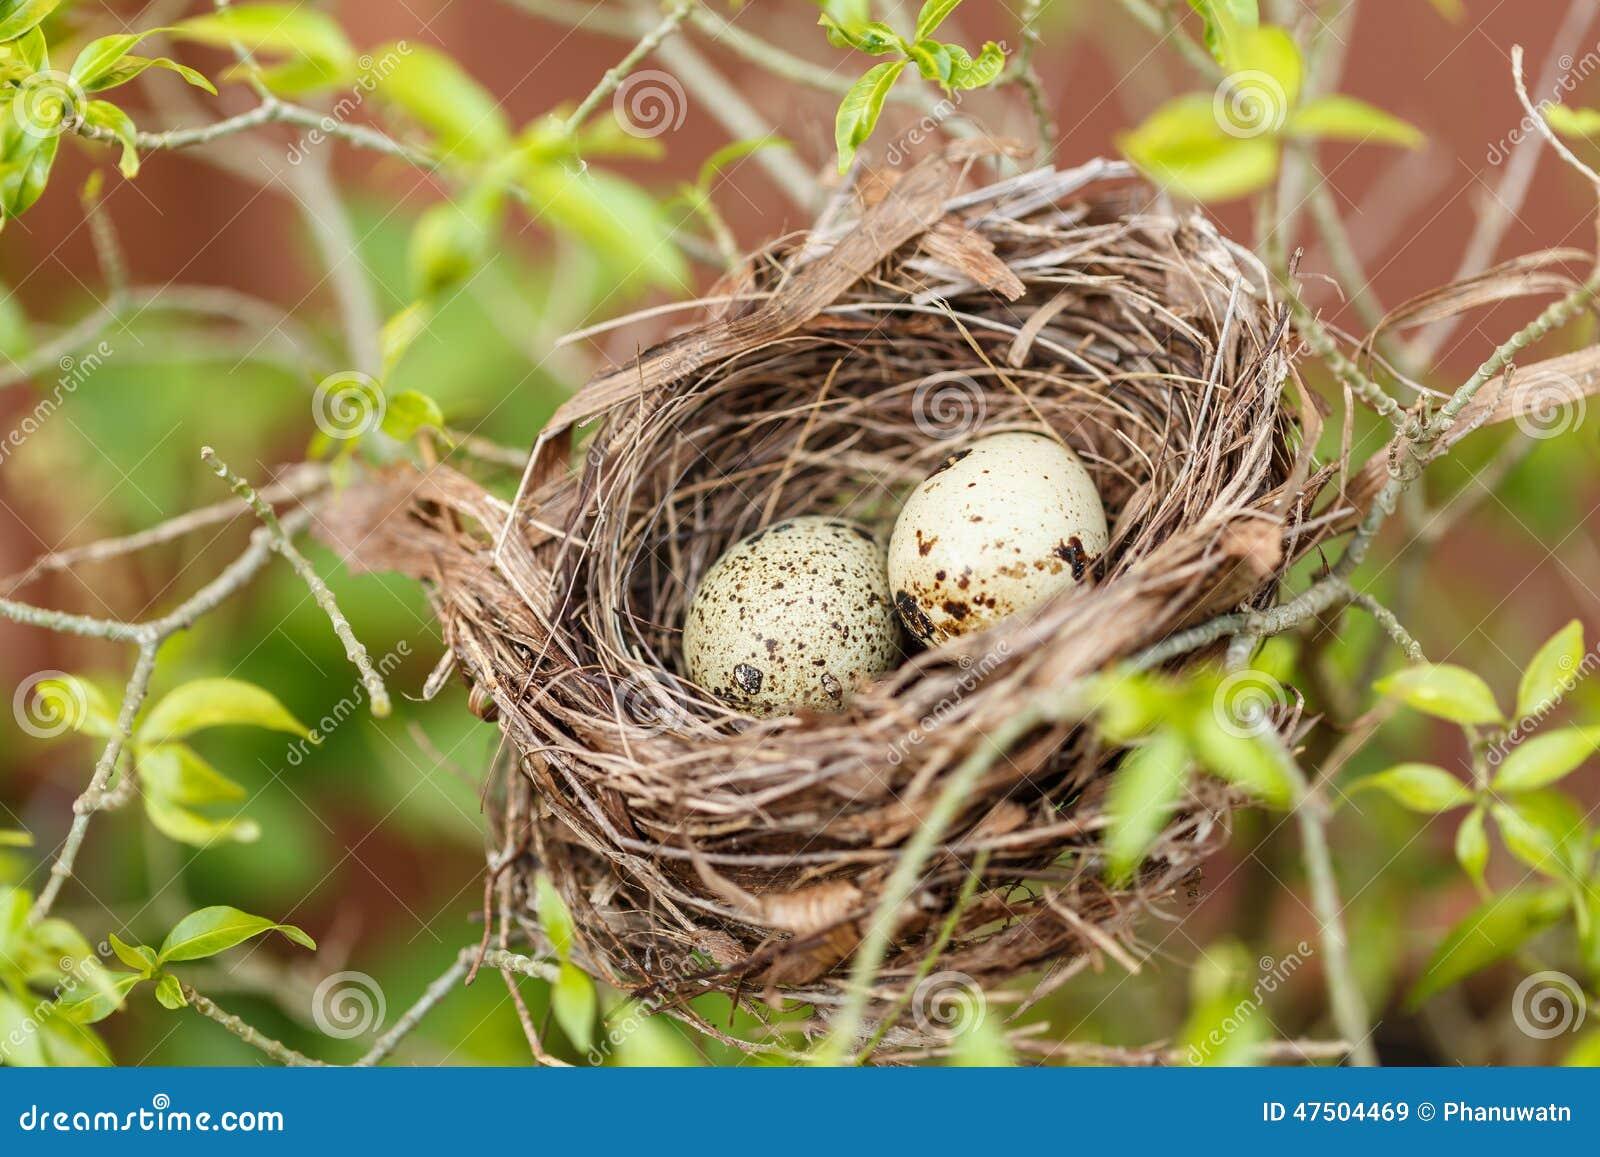 how to open quail eggs